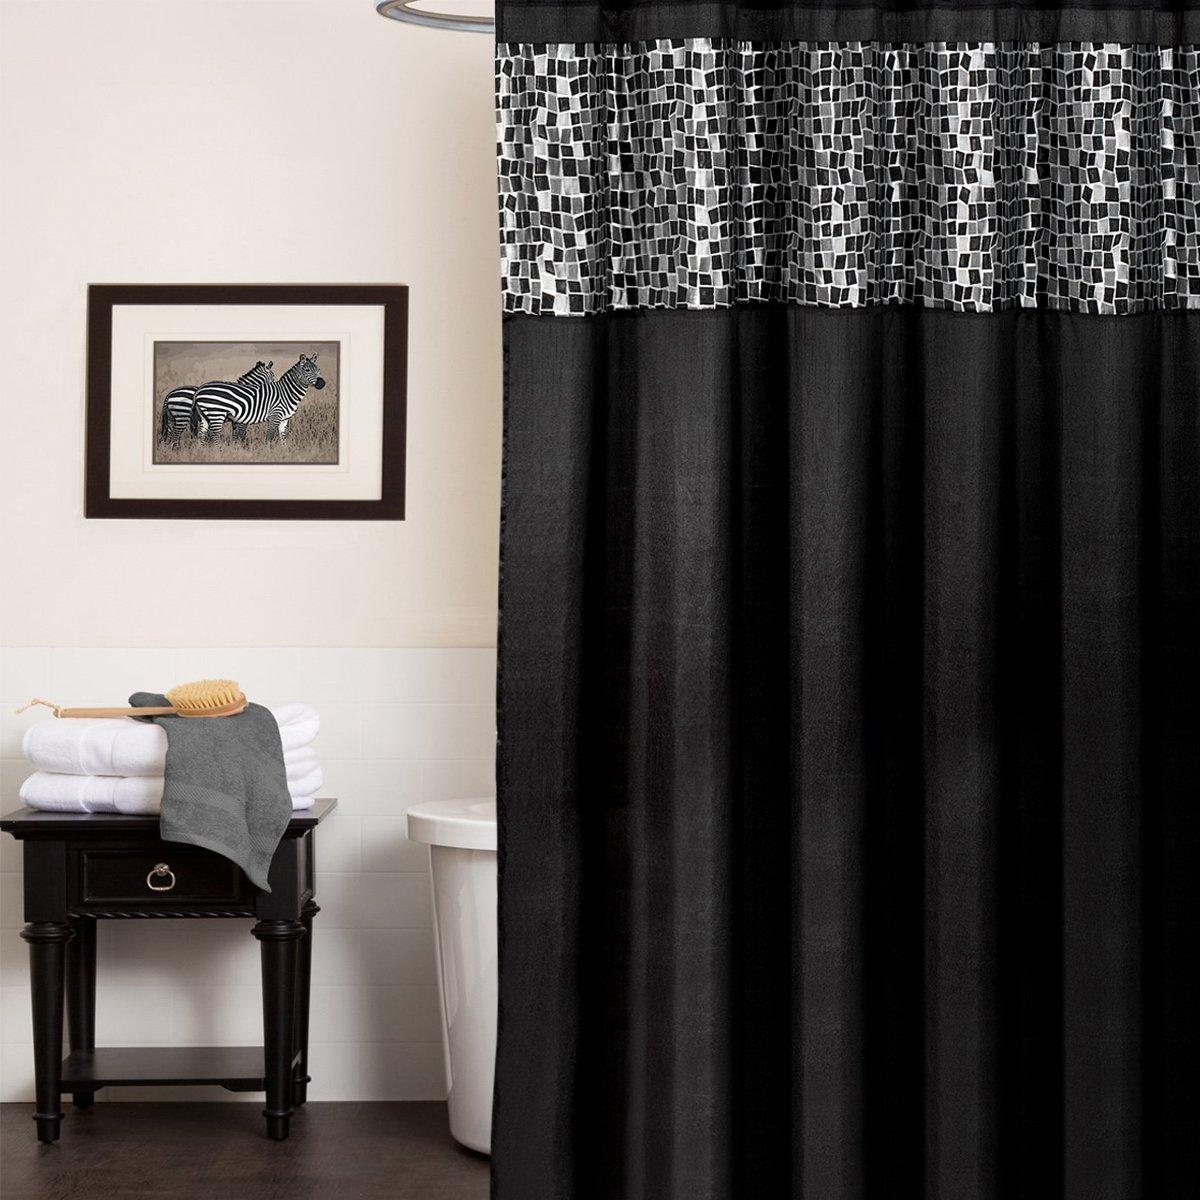 Sinatra silver shower curtain - Sinatra Silver Shower Curtain 39